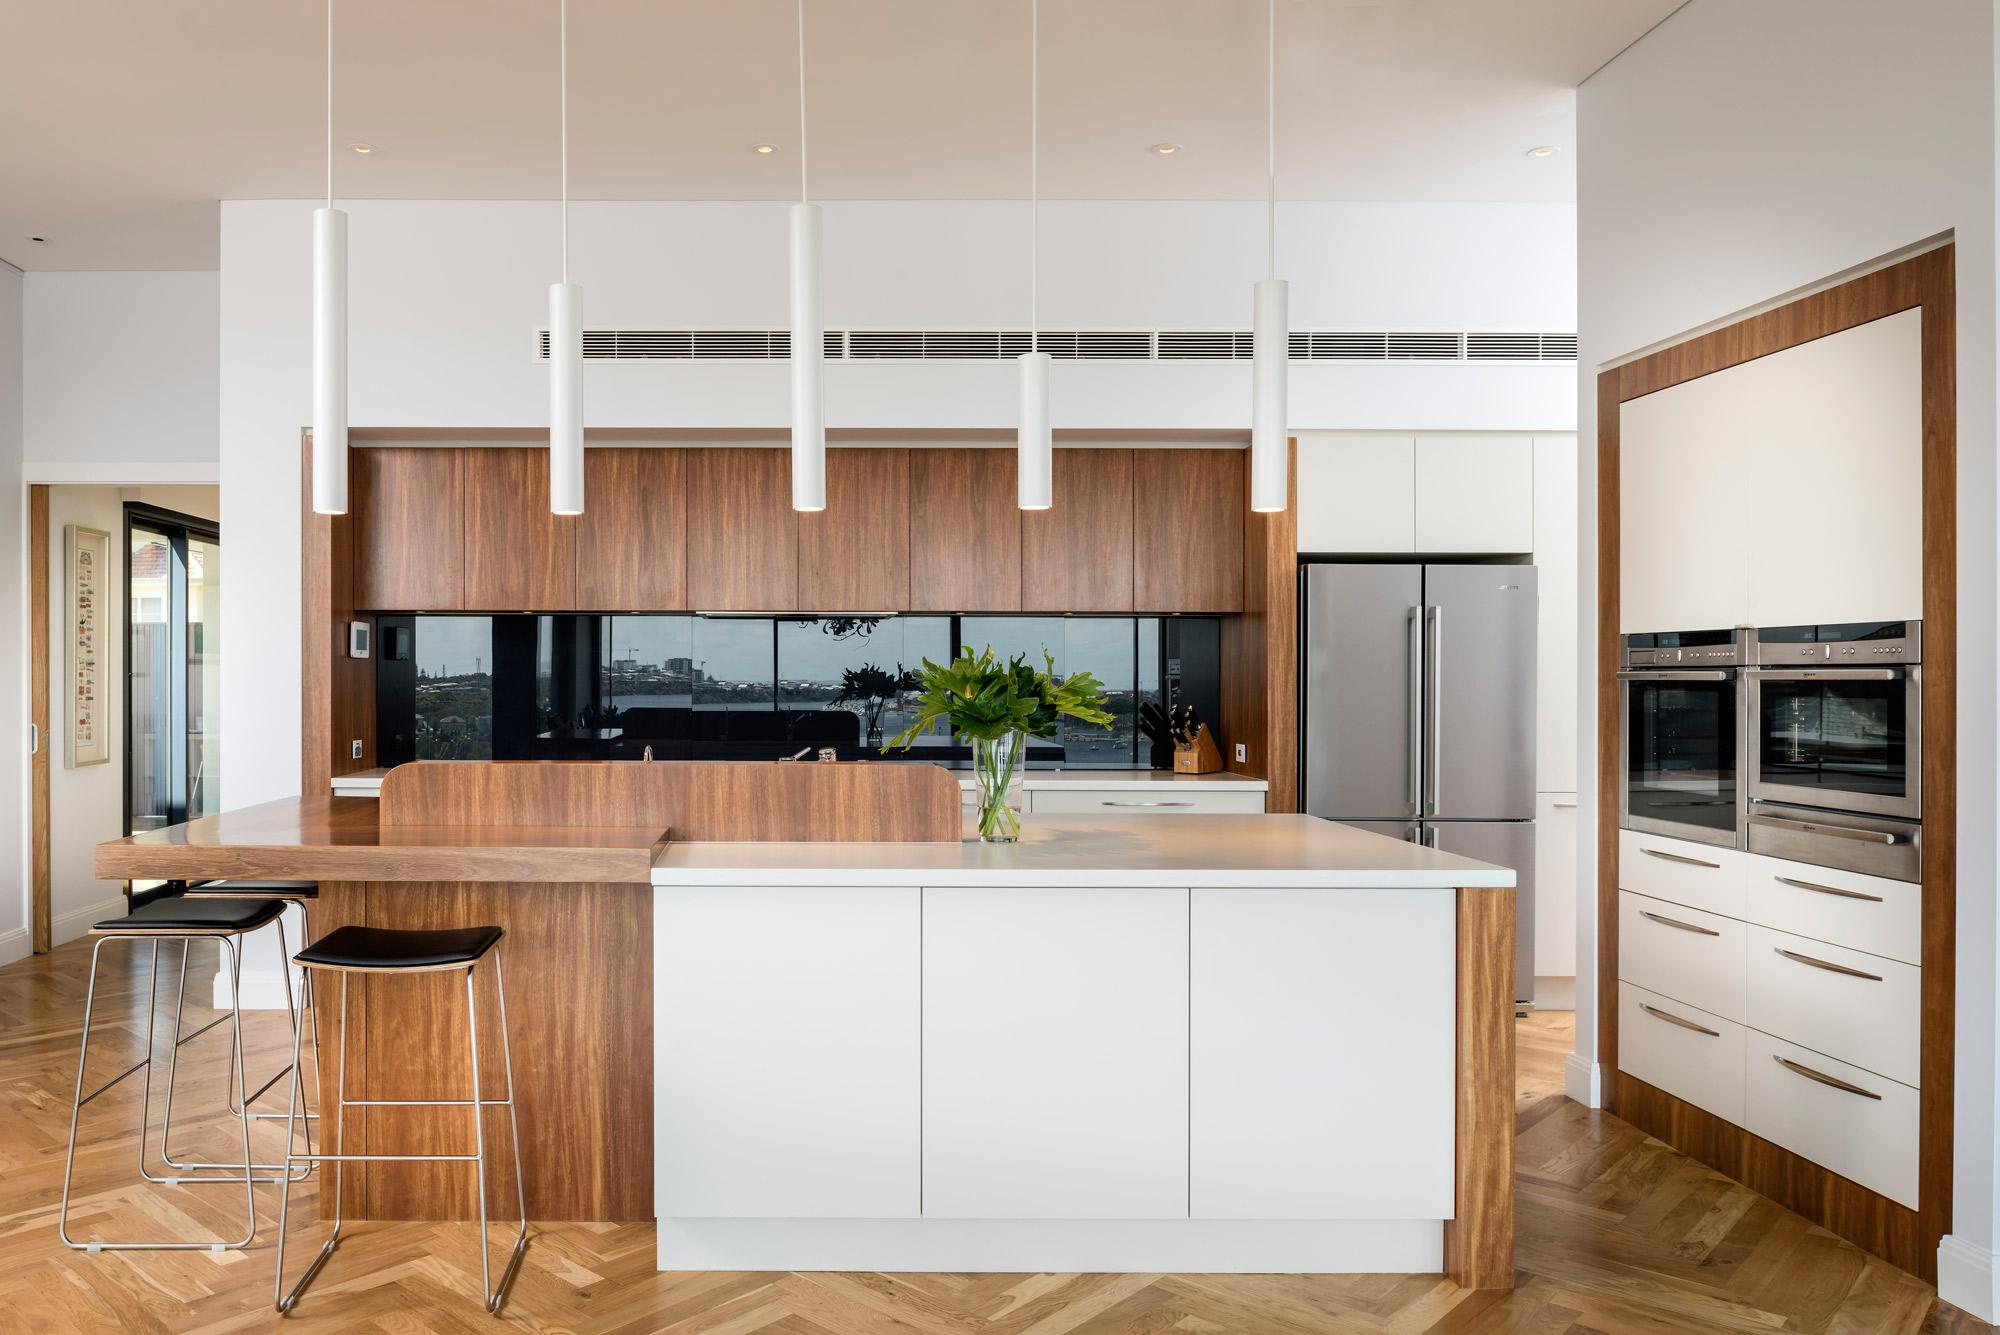 Western Cabinets | Renovations,Interior Design,Custom Kitchens